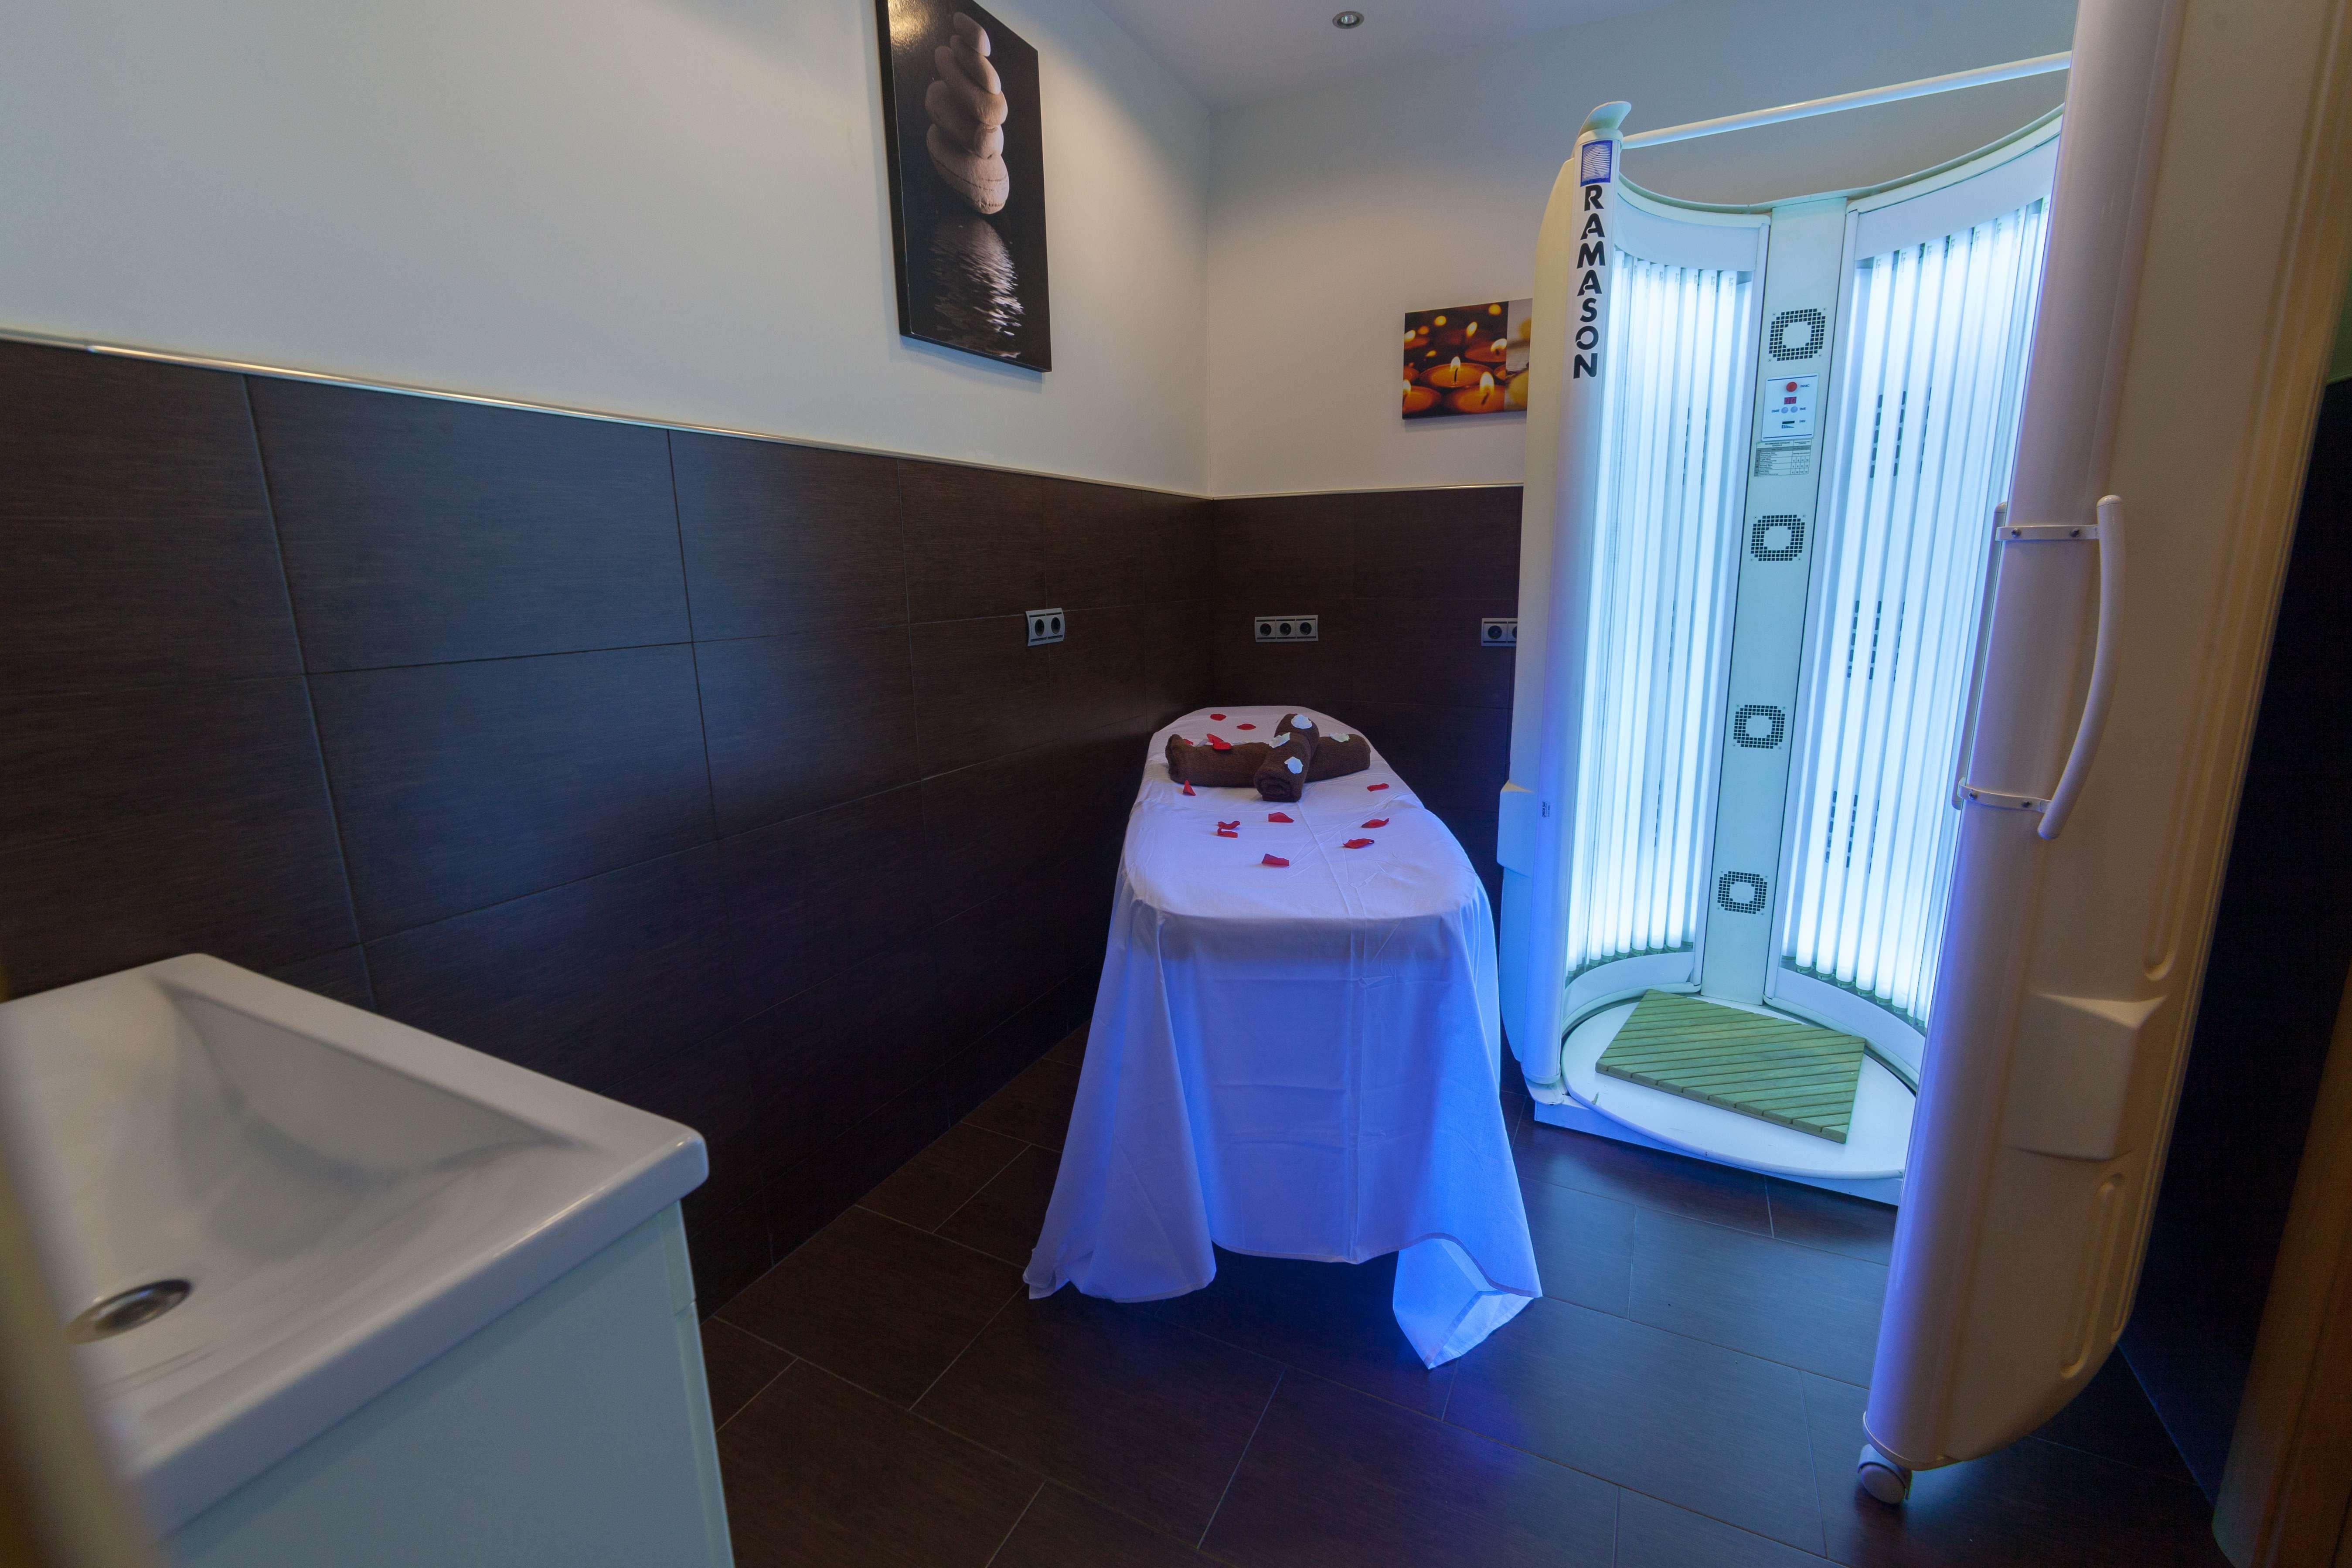 Centro de estética y belleza en Aguadulce